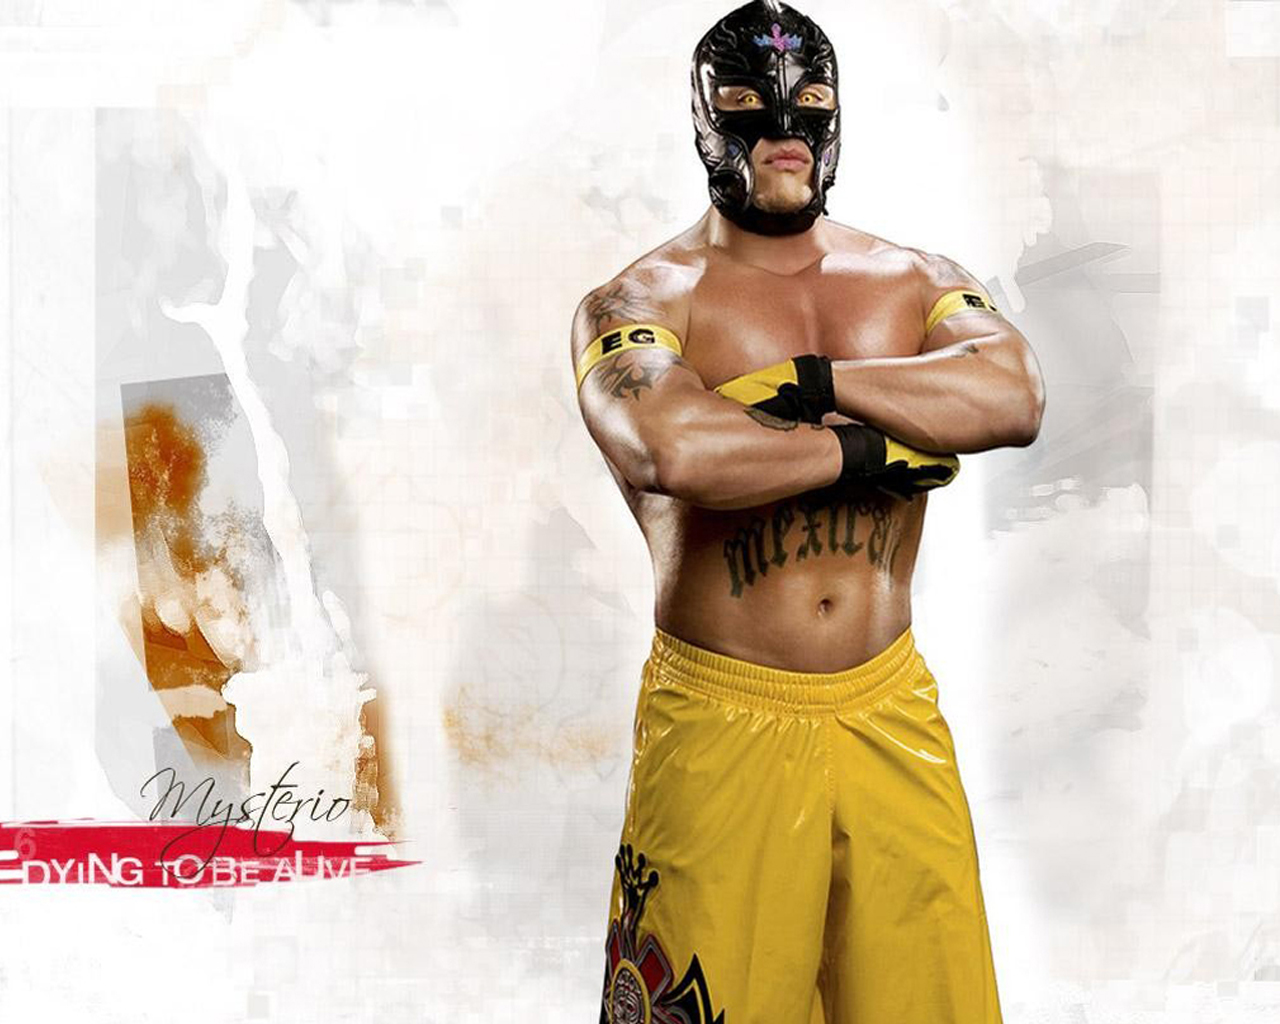 http://2.bp.blogspot.com/-BqY5bdMhNKA/T_voYJoo-hI/AAAAAAAAV1U/gd-v3ajswcQ/s1600/American+WWE+Superstar+Wrestler+Rey+Mysterio+Wallpapers+2012.jpg